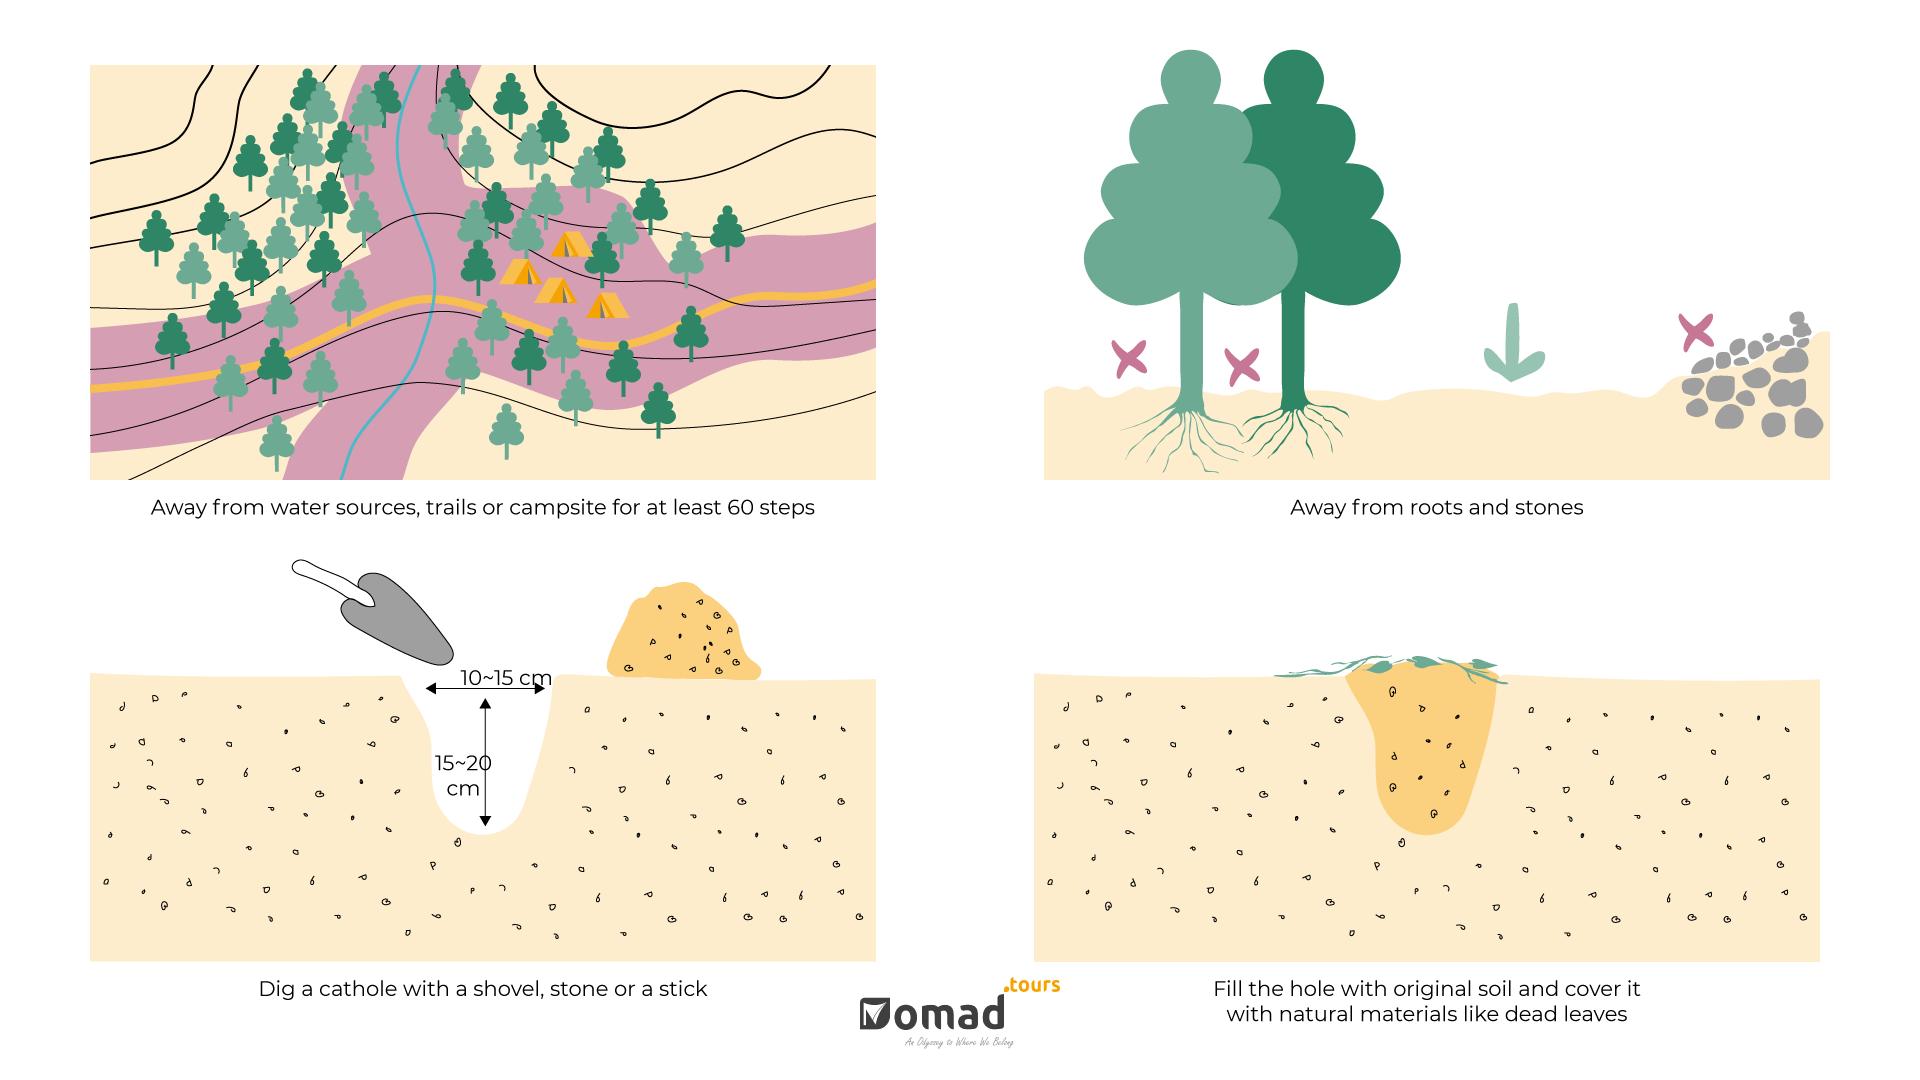 How & Where to Dig a Cathole